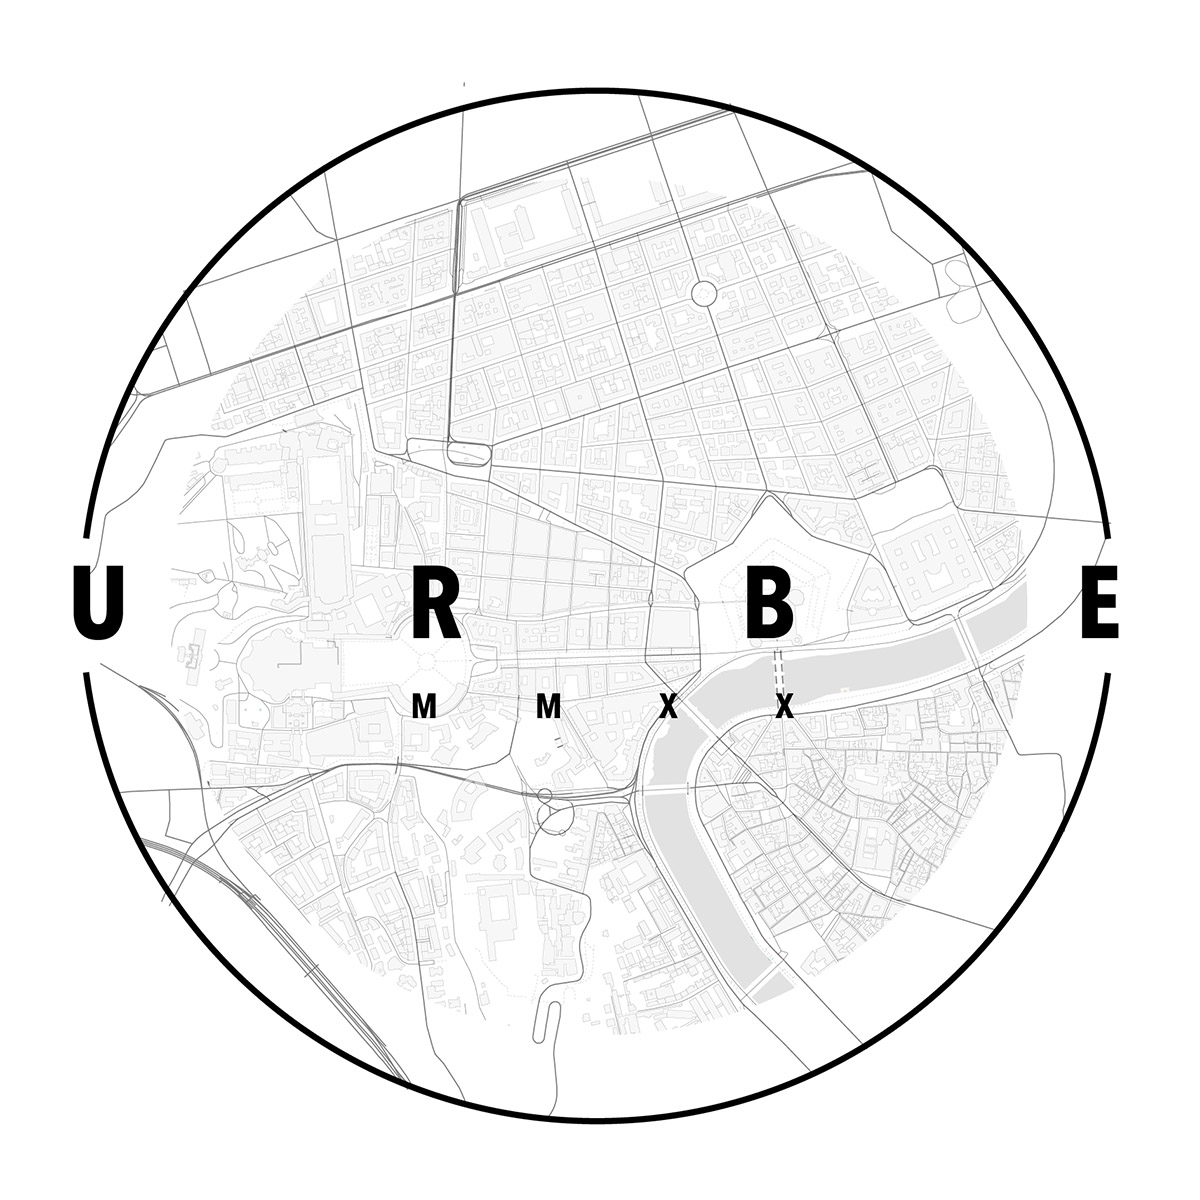 URBE mmxx logo